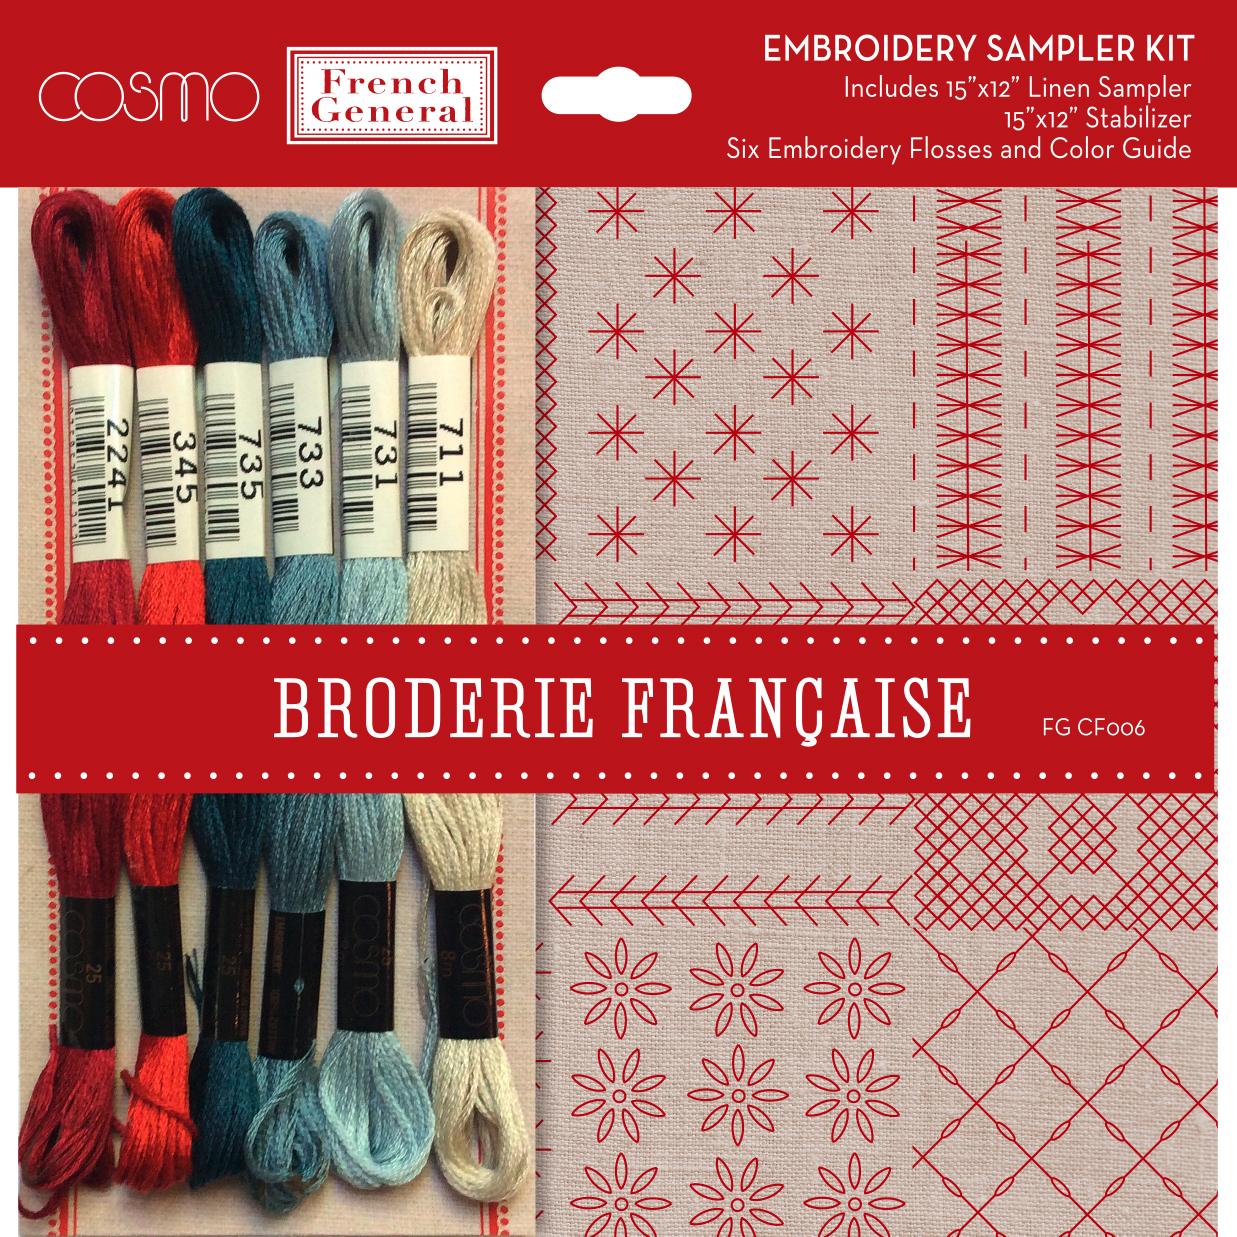 Broderie Francaise 15 x 12